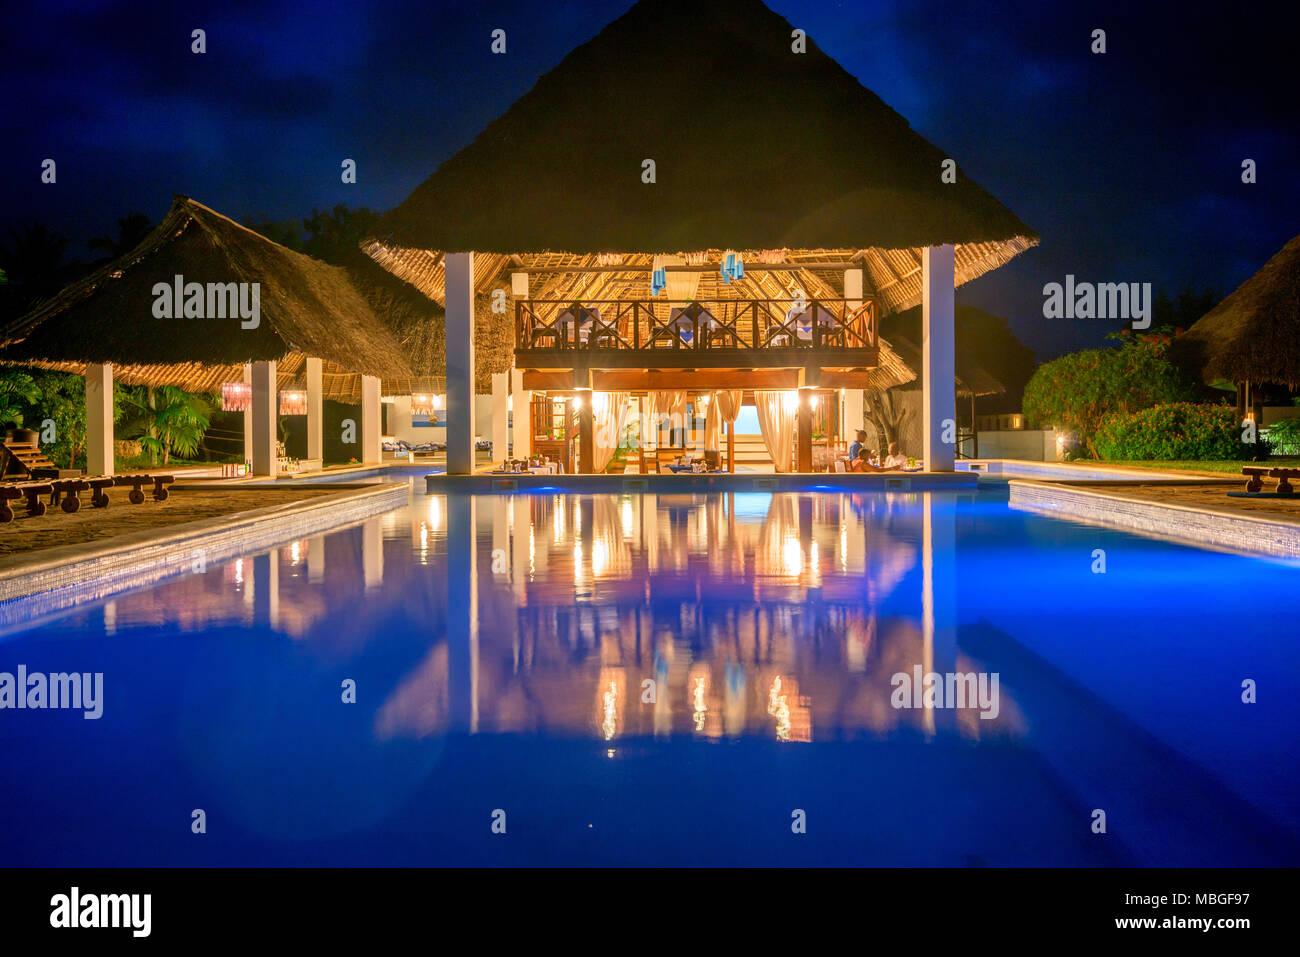 ZANZIBAR, TANZANIA - JANUARY 8, 2015: Pool in tropical hotel Karafuu in Zanzibar - Stock Image